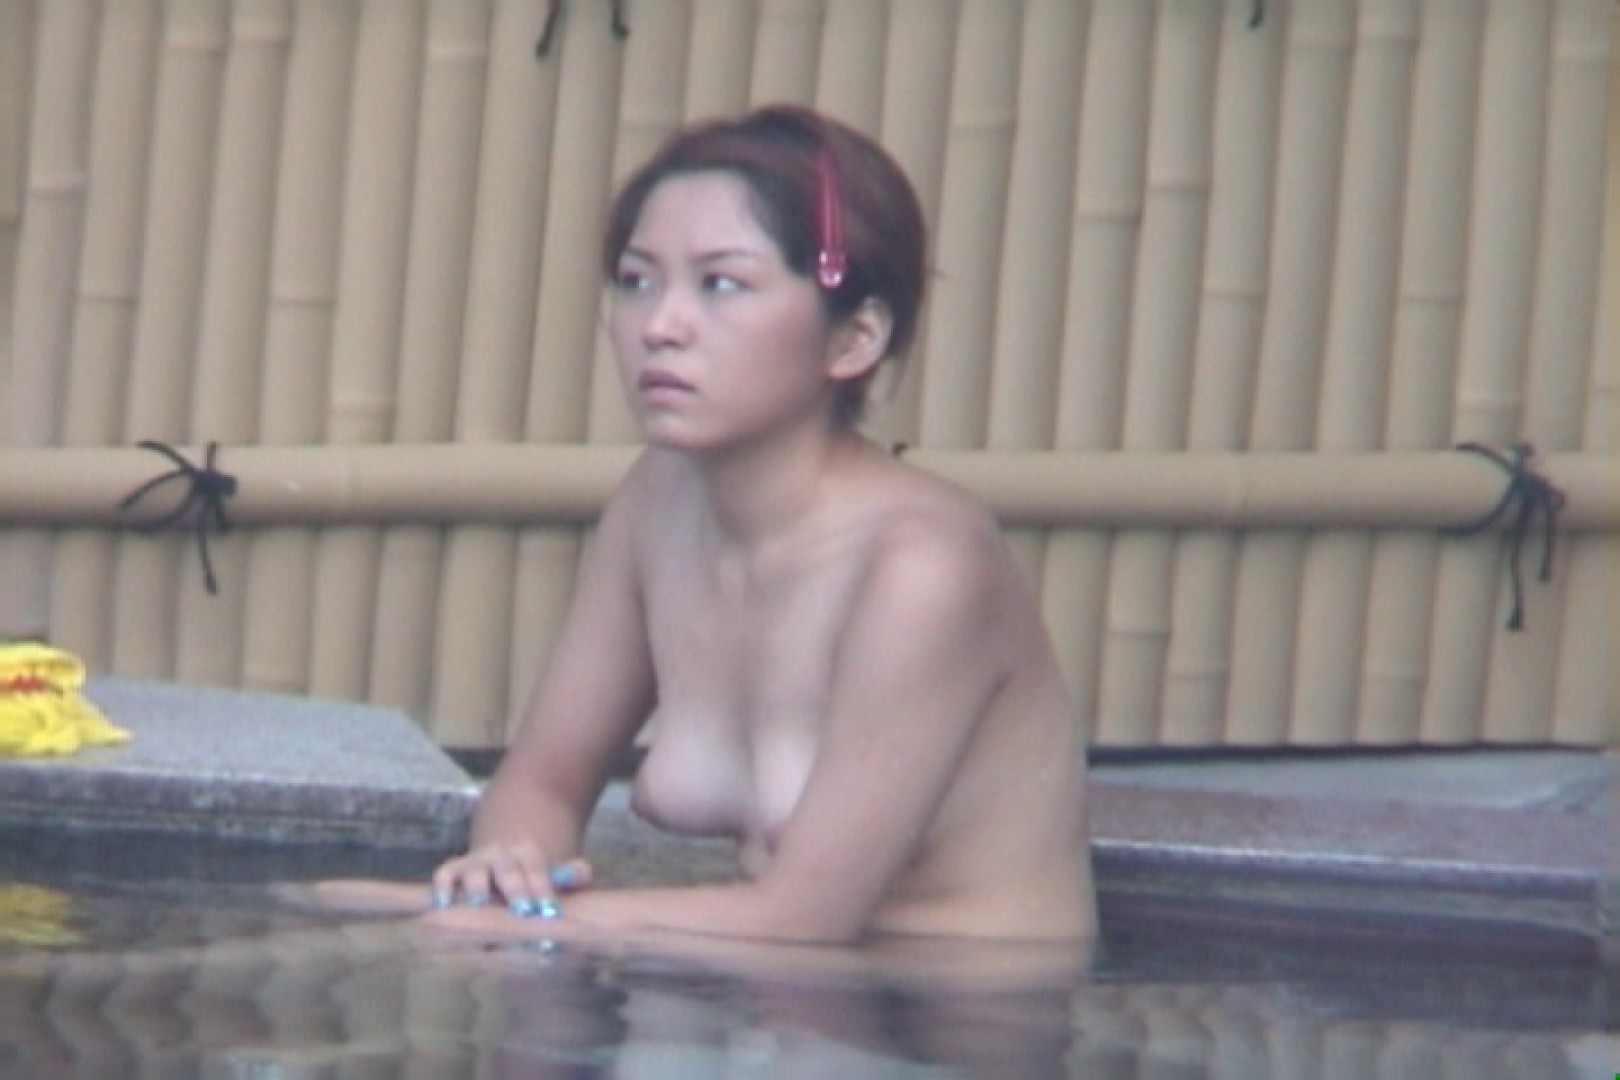 Aquaな露天風呂Vol.574 盗撮シリーズ | 露天風呂編  87PIX 59